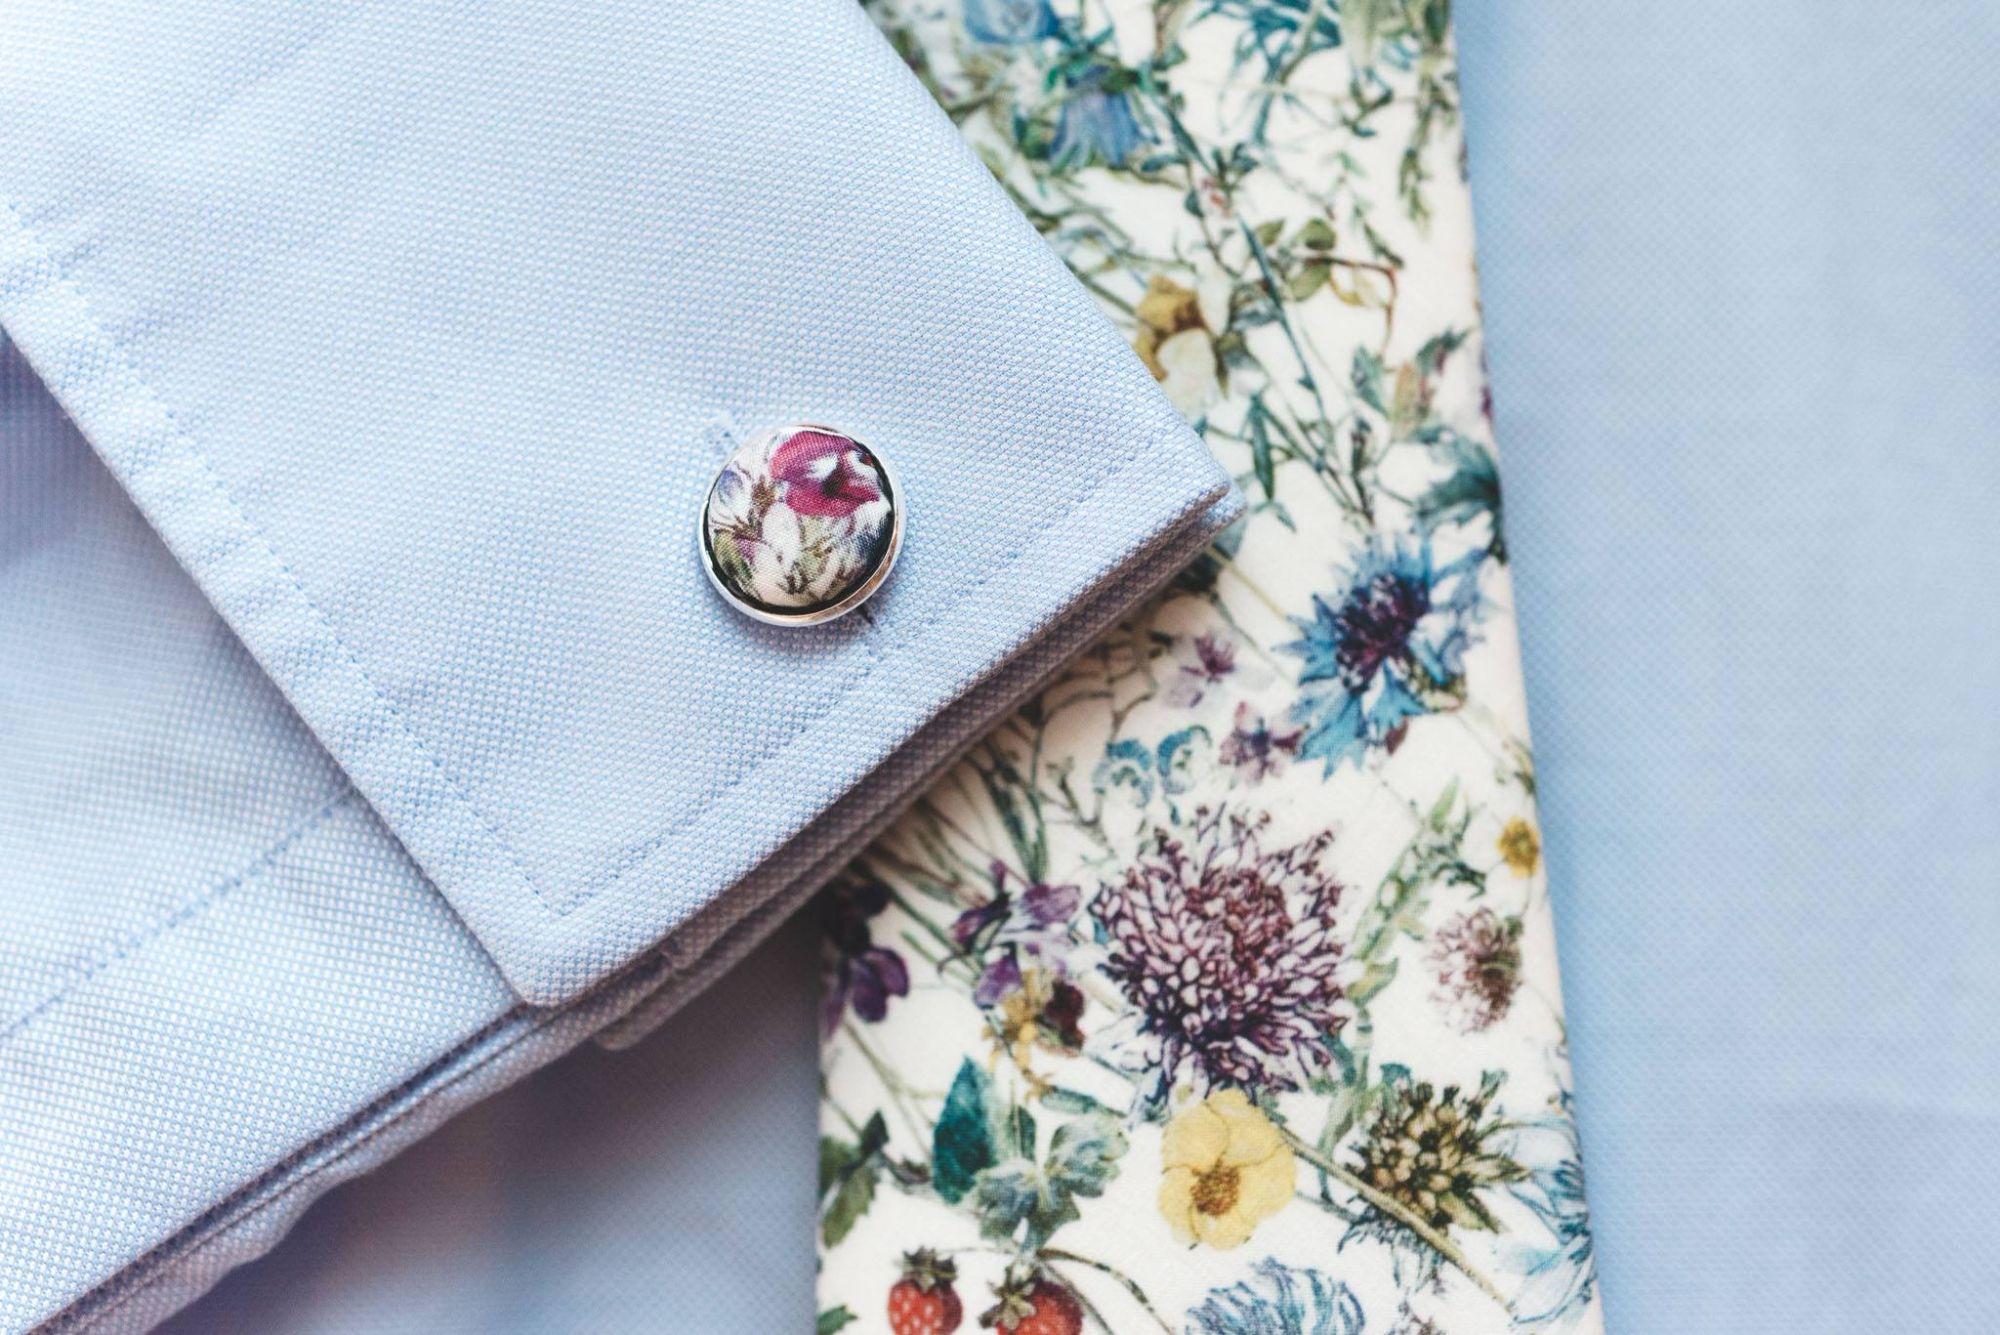 matching cuff-links